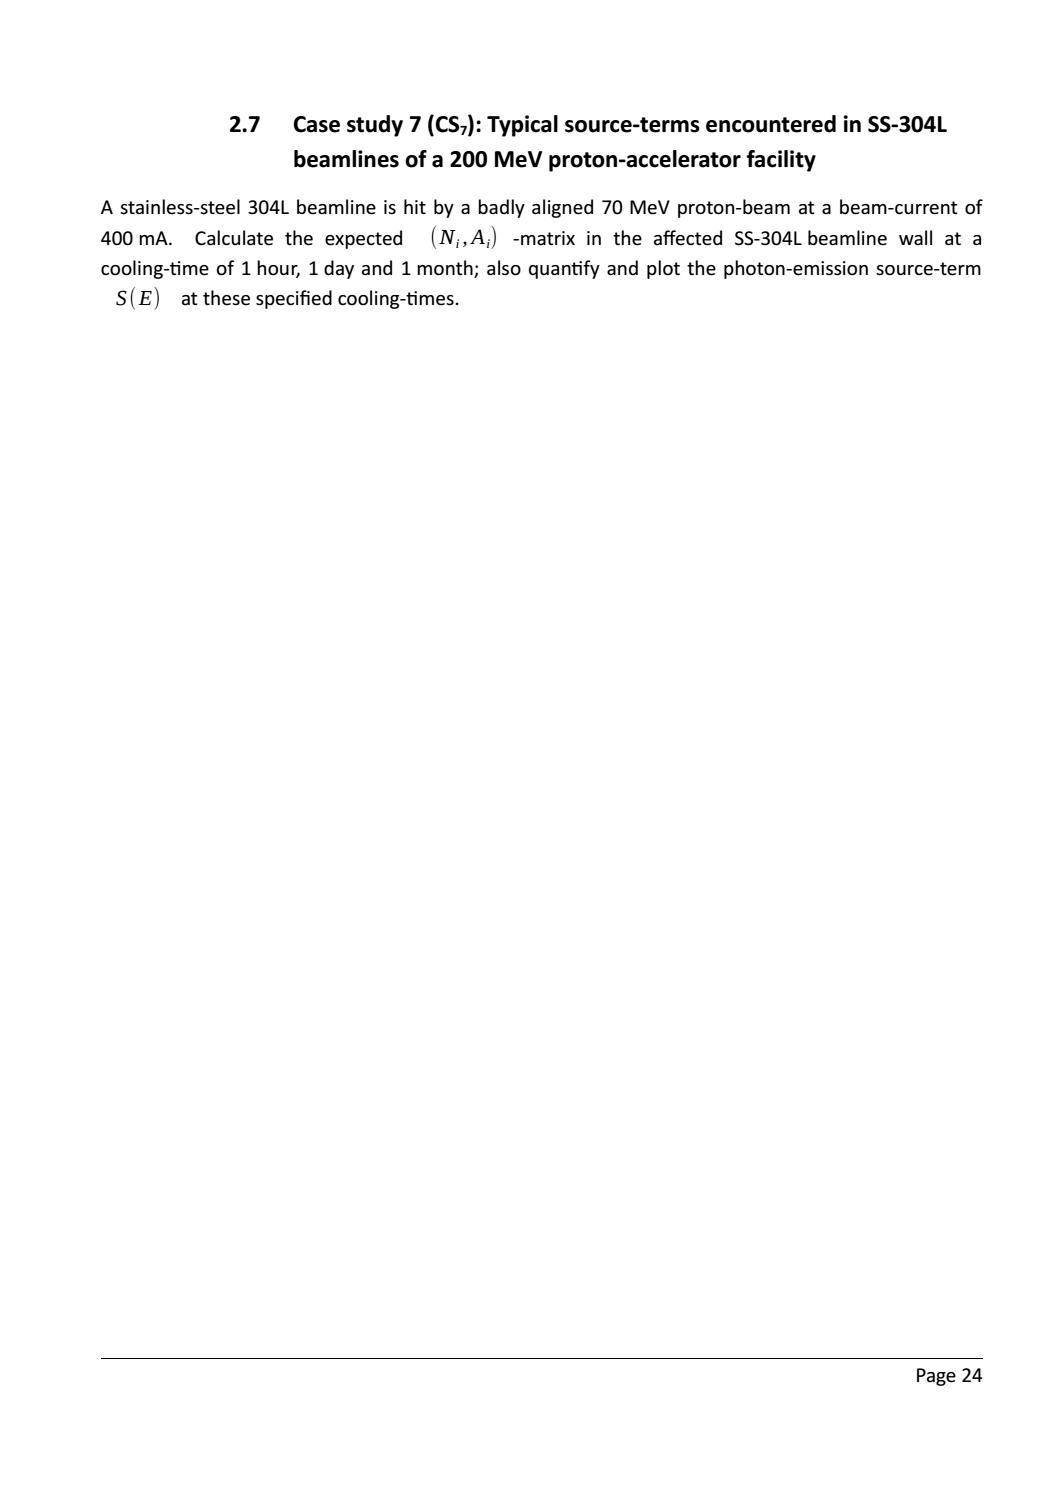 RADIOACTIVE WASTE: COMPUTATIONAL CHARACTERISATION and SHIELDING page 49